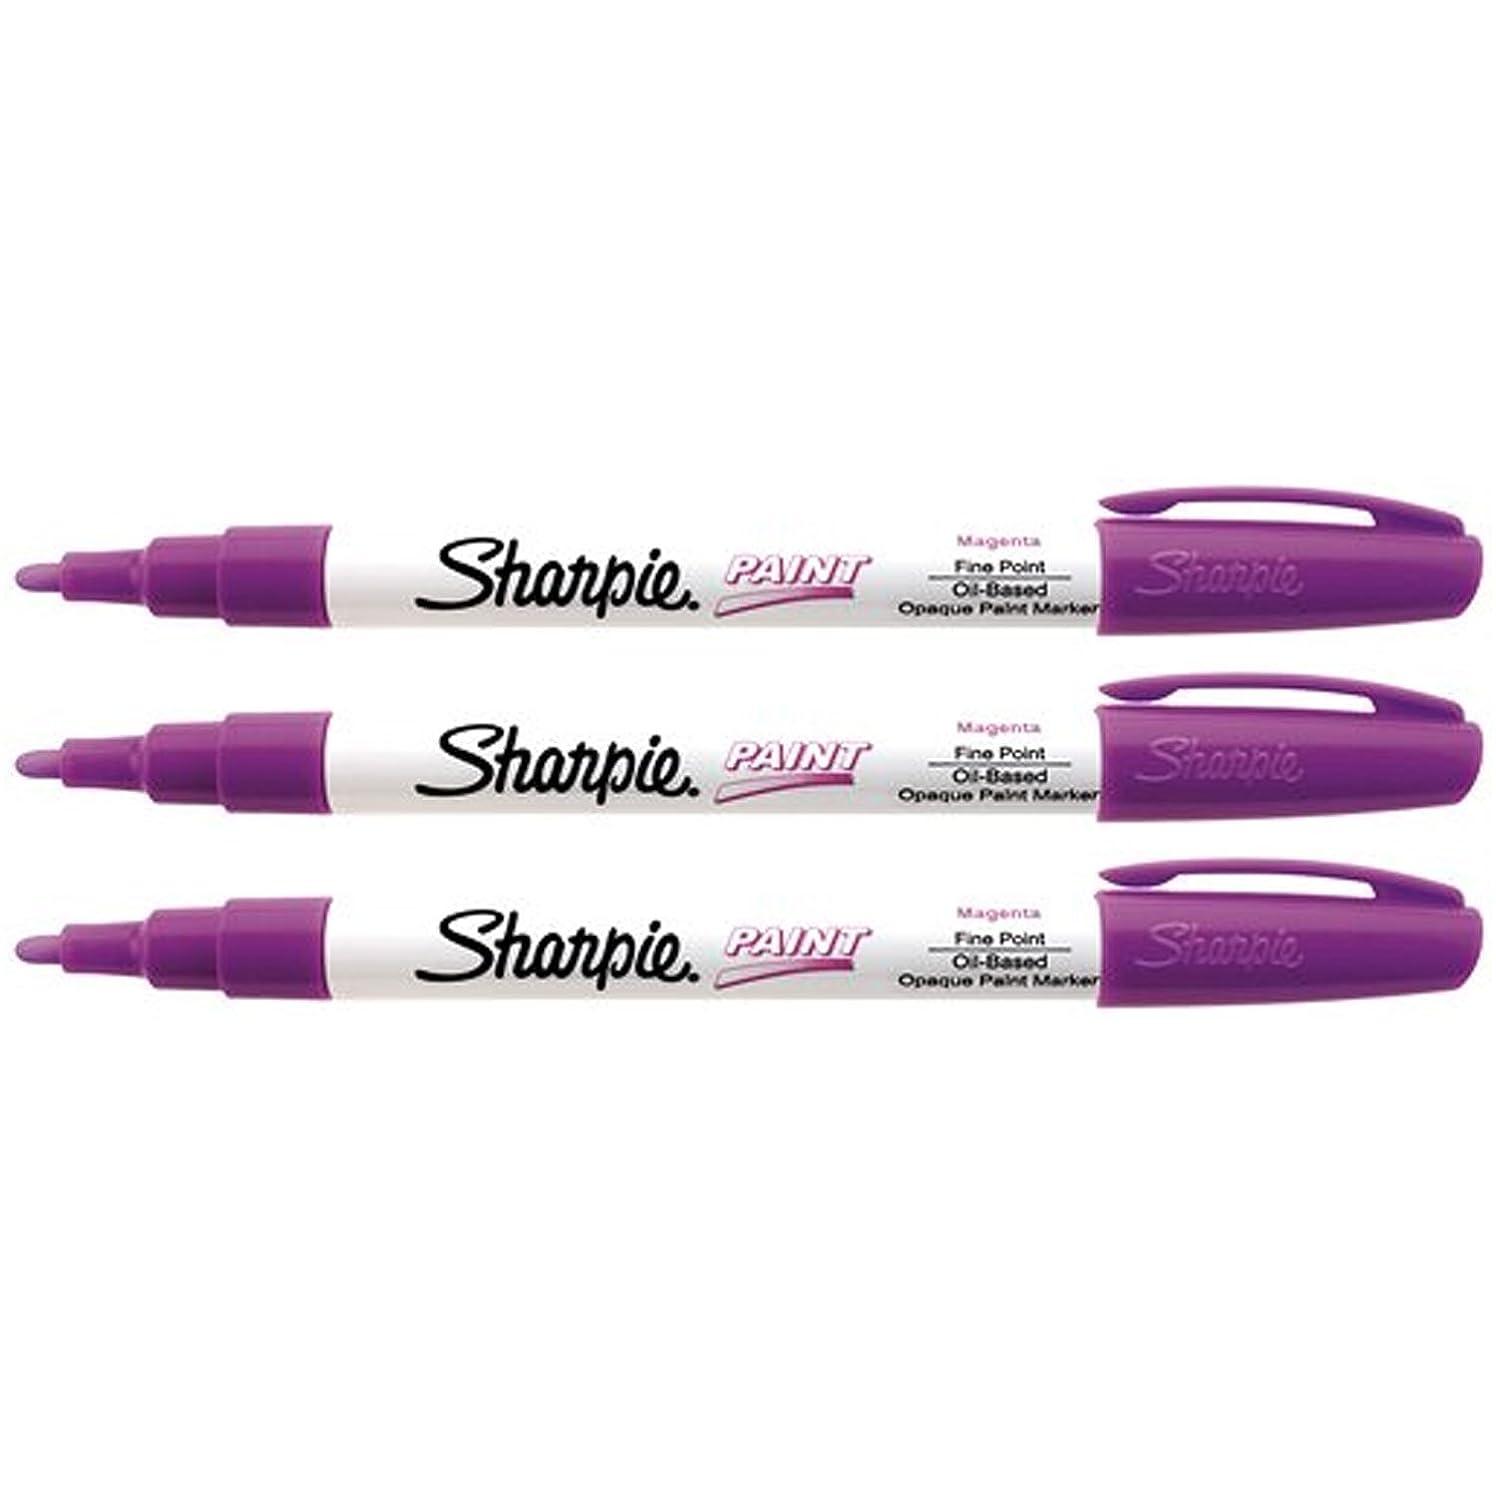 Fine Point Paint Marker [Set of 3] Color: Magenta